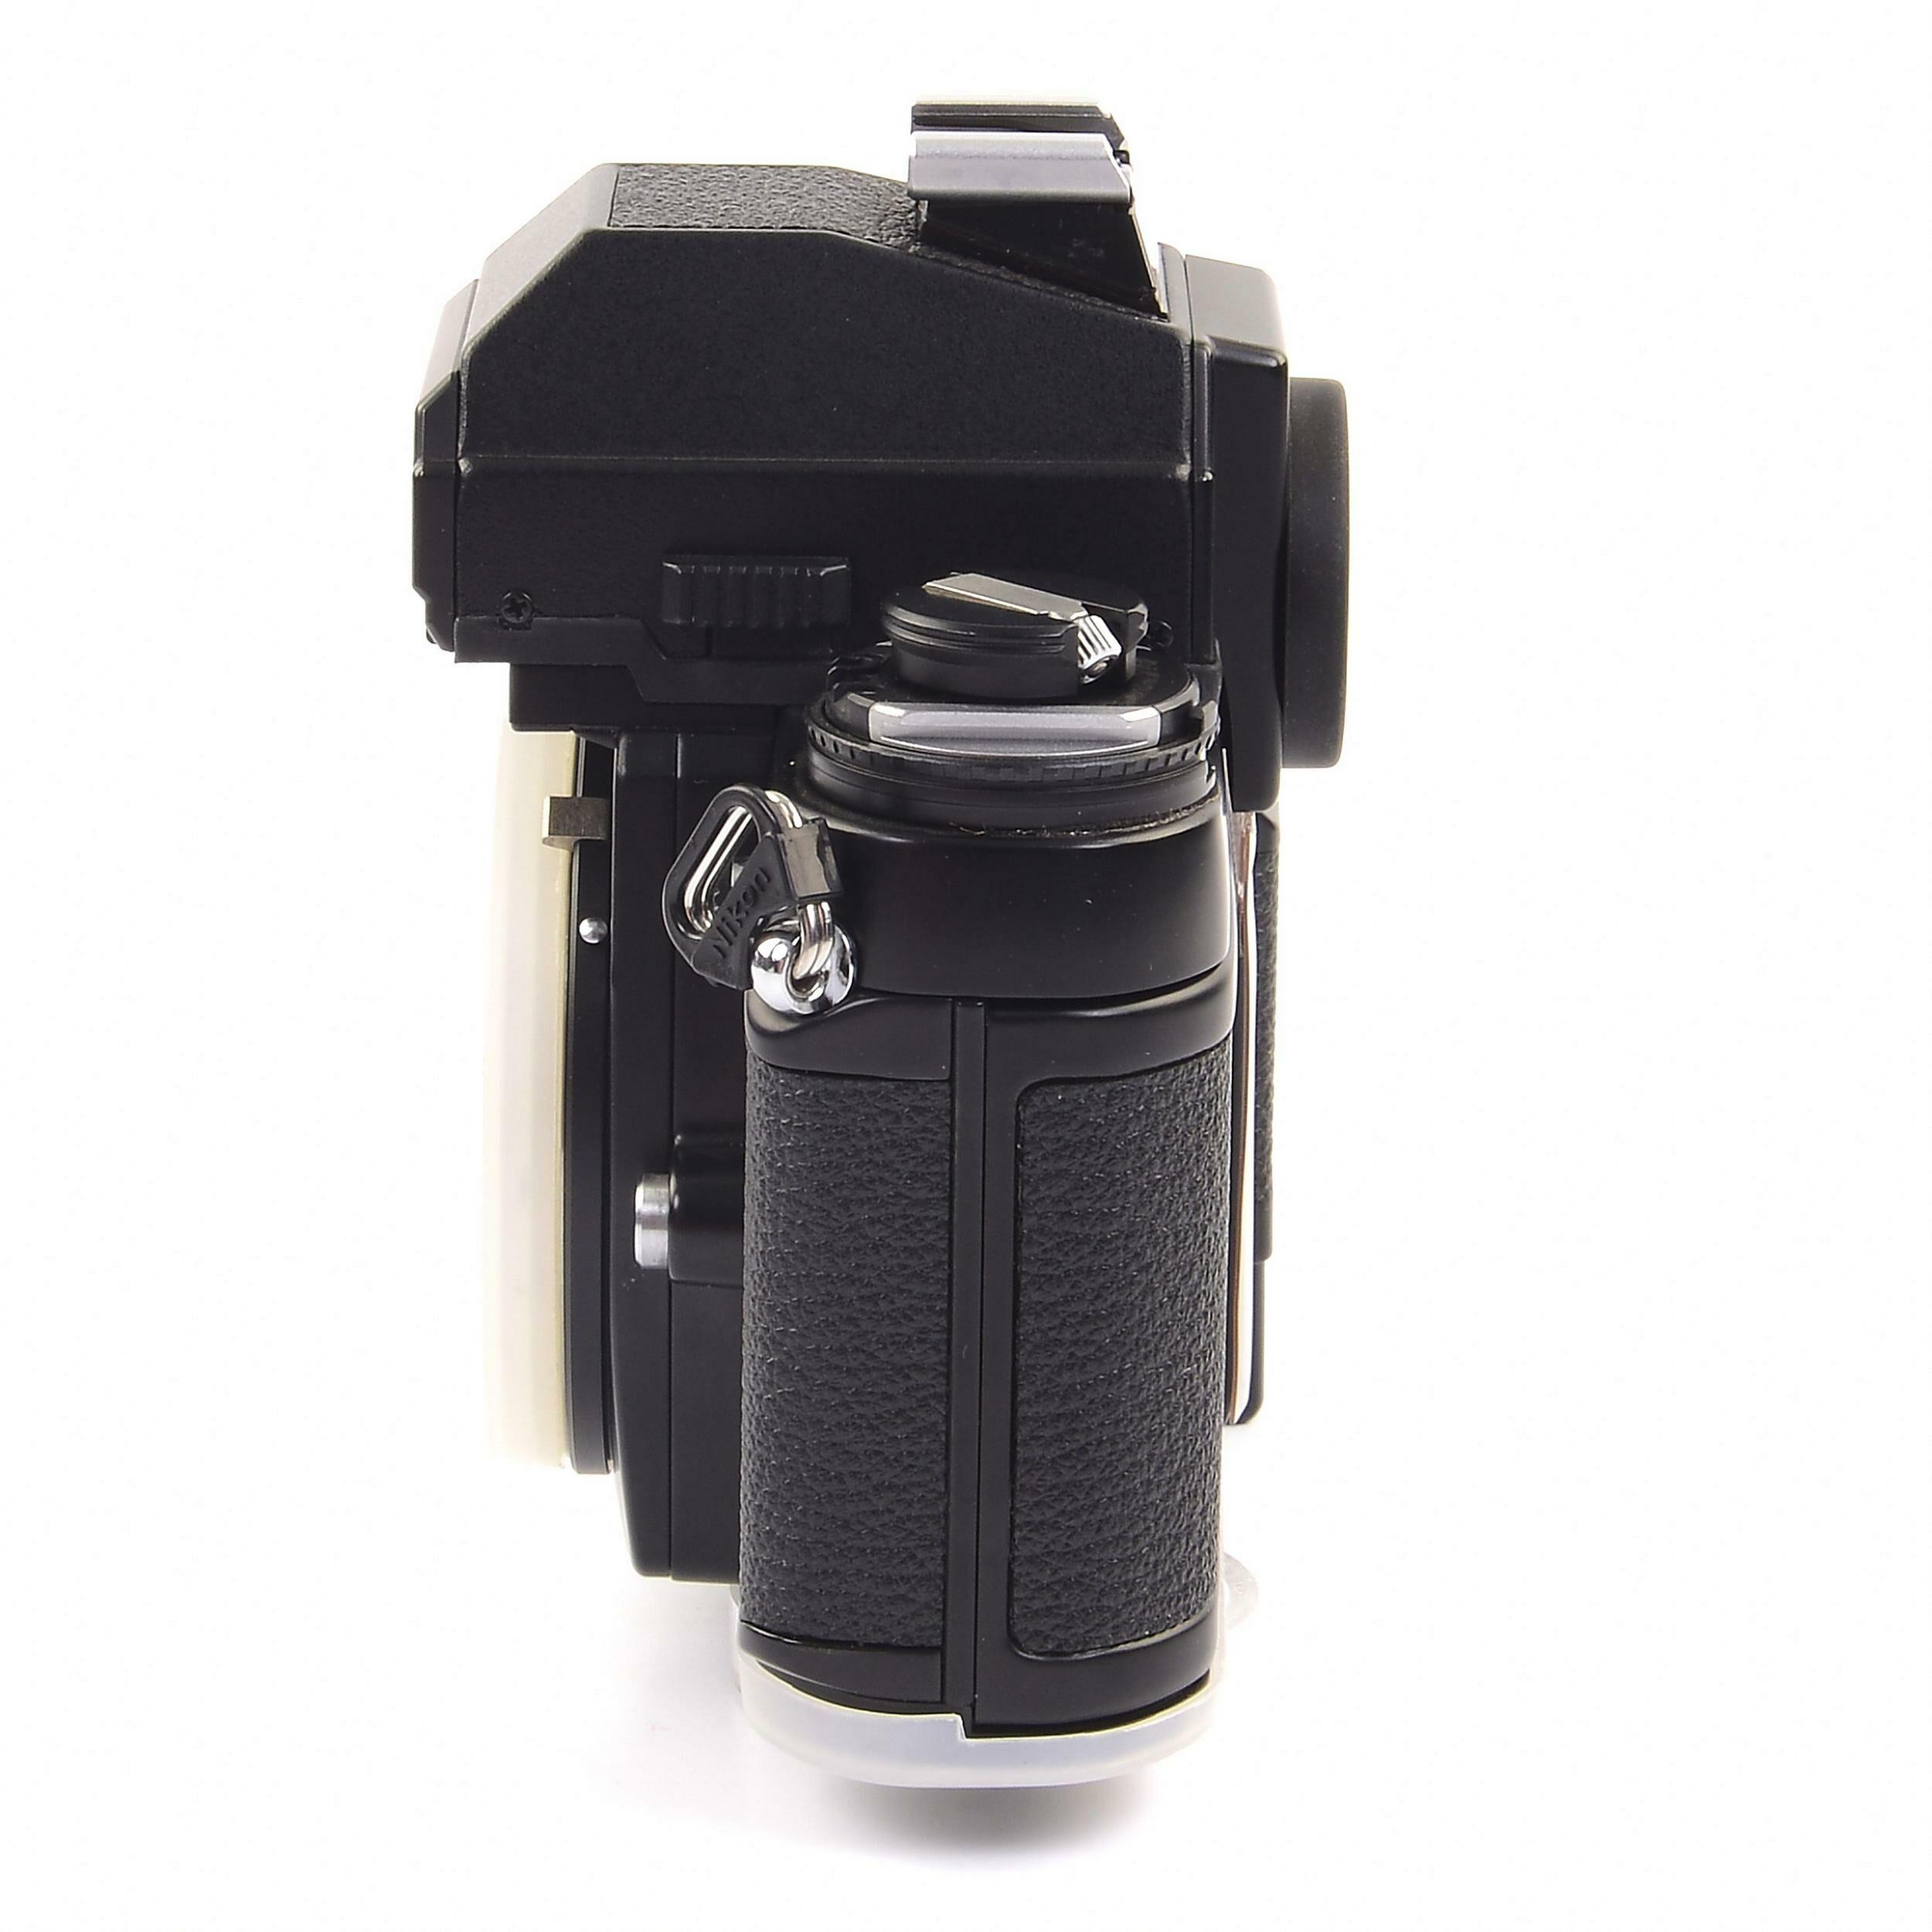 Nikon F3p High Eyepoint Hp Press Camera Box 1071 Ebay Parts Diagram F3 P